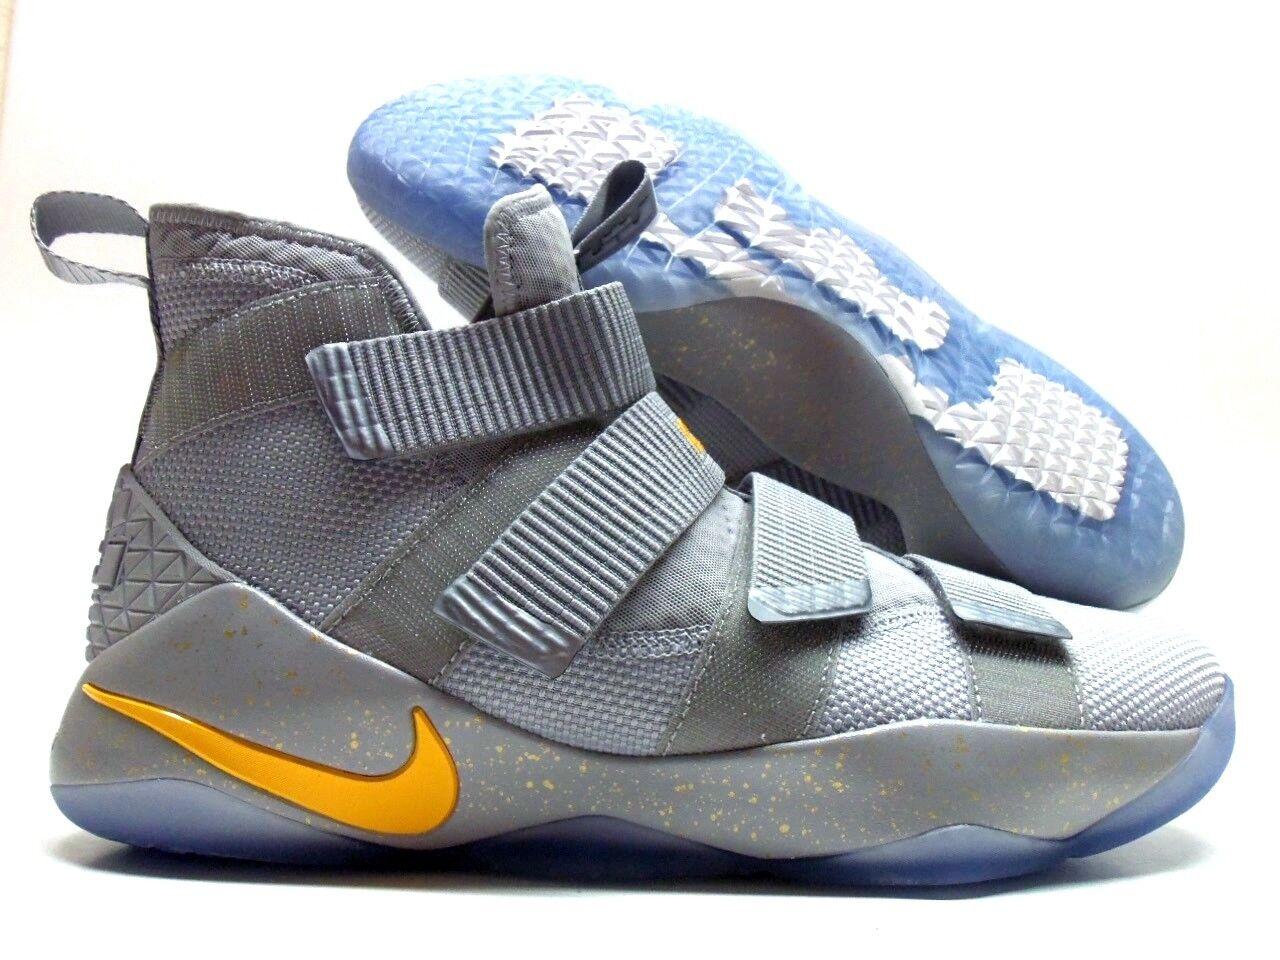 Nike Lebron Soldato Id Xi Sfg Id Soldato Cool Grey / Tour Giallo Dimensioni Uomini 12 [Ao2577-993] d85cd4